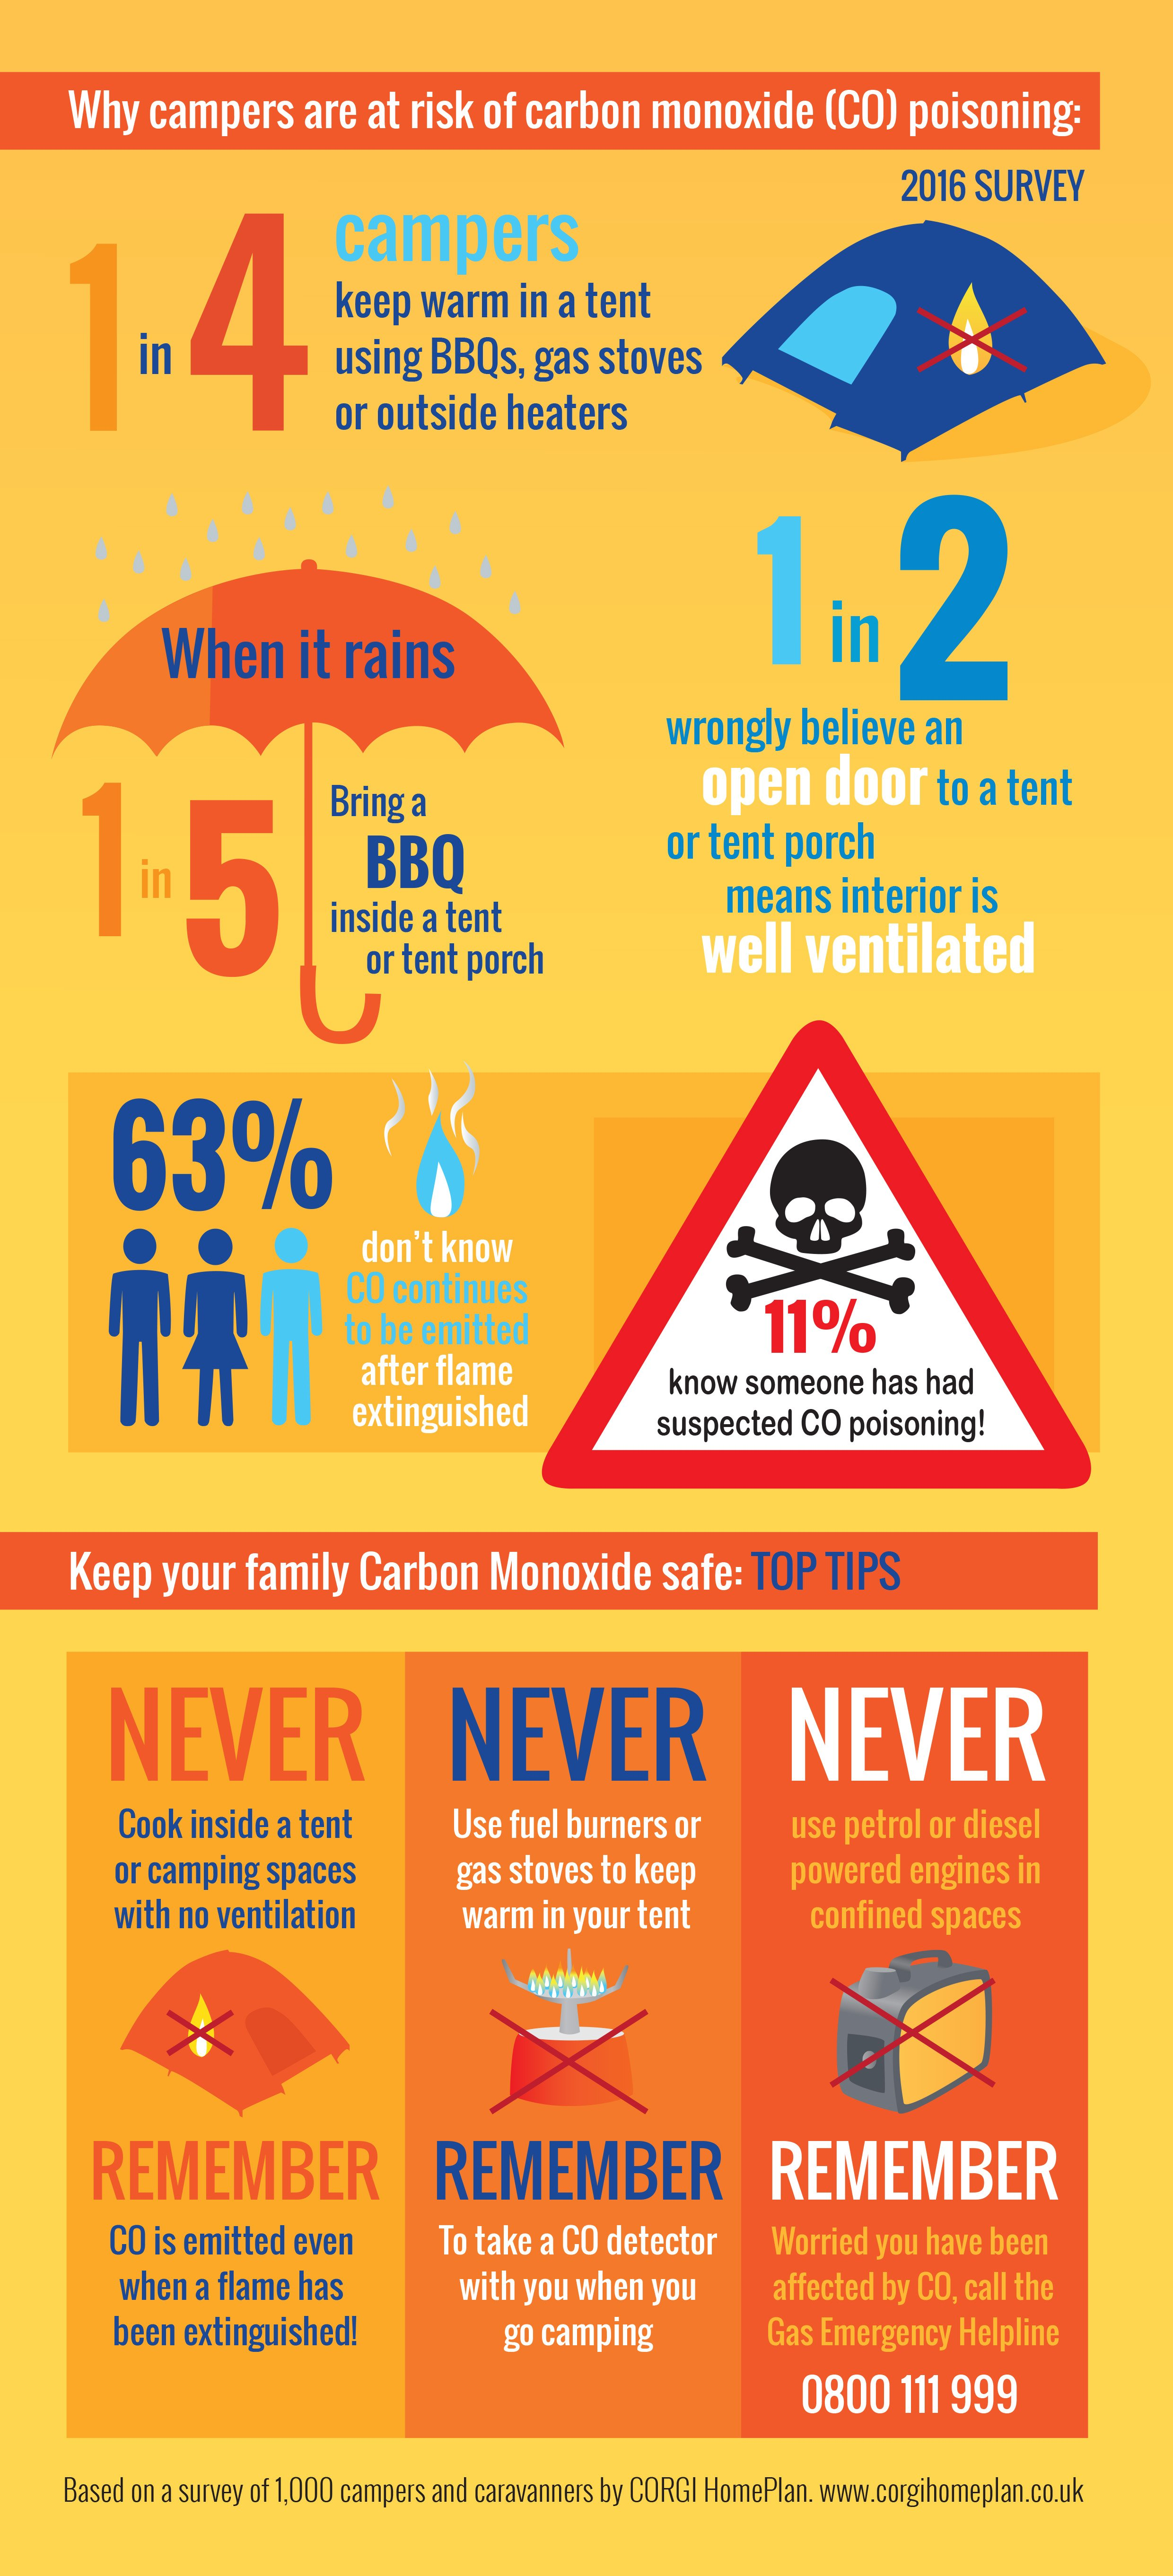 The Dangers of Carbon Monoxide when Camping